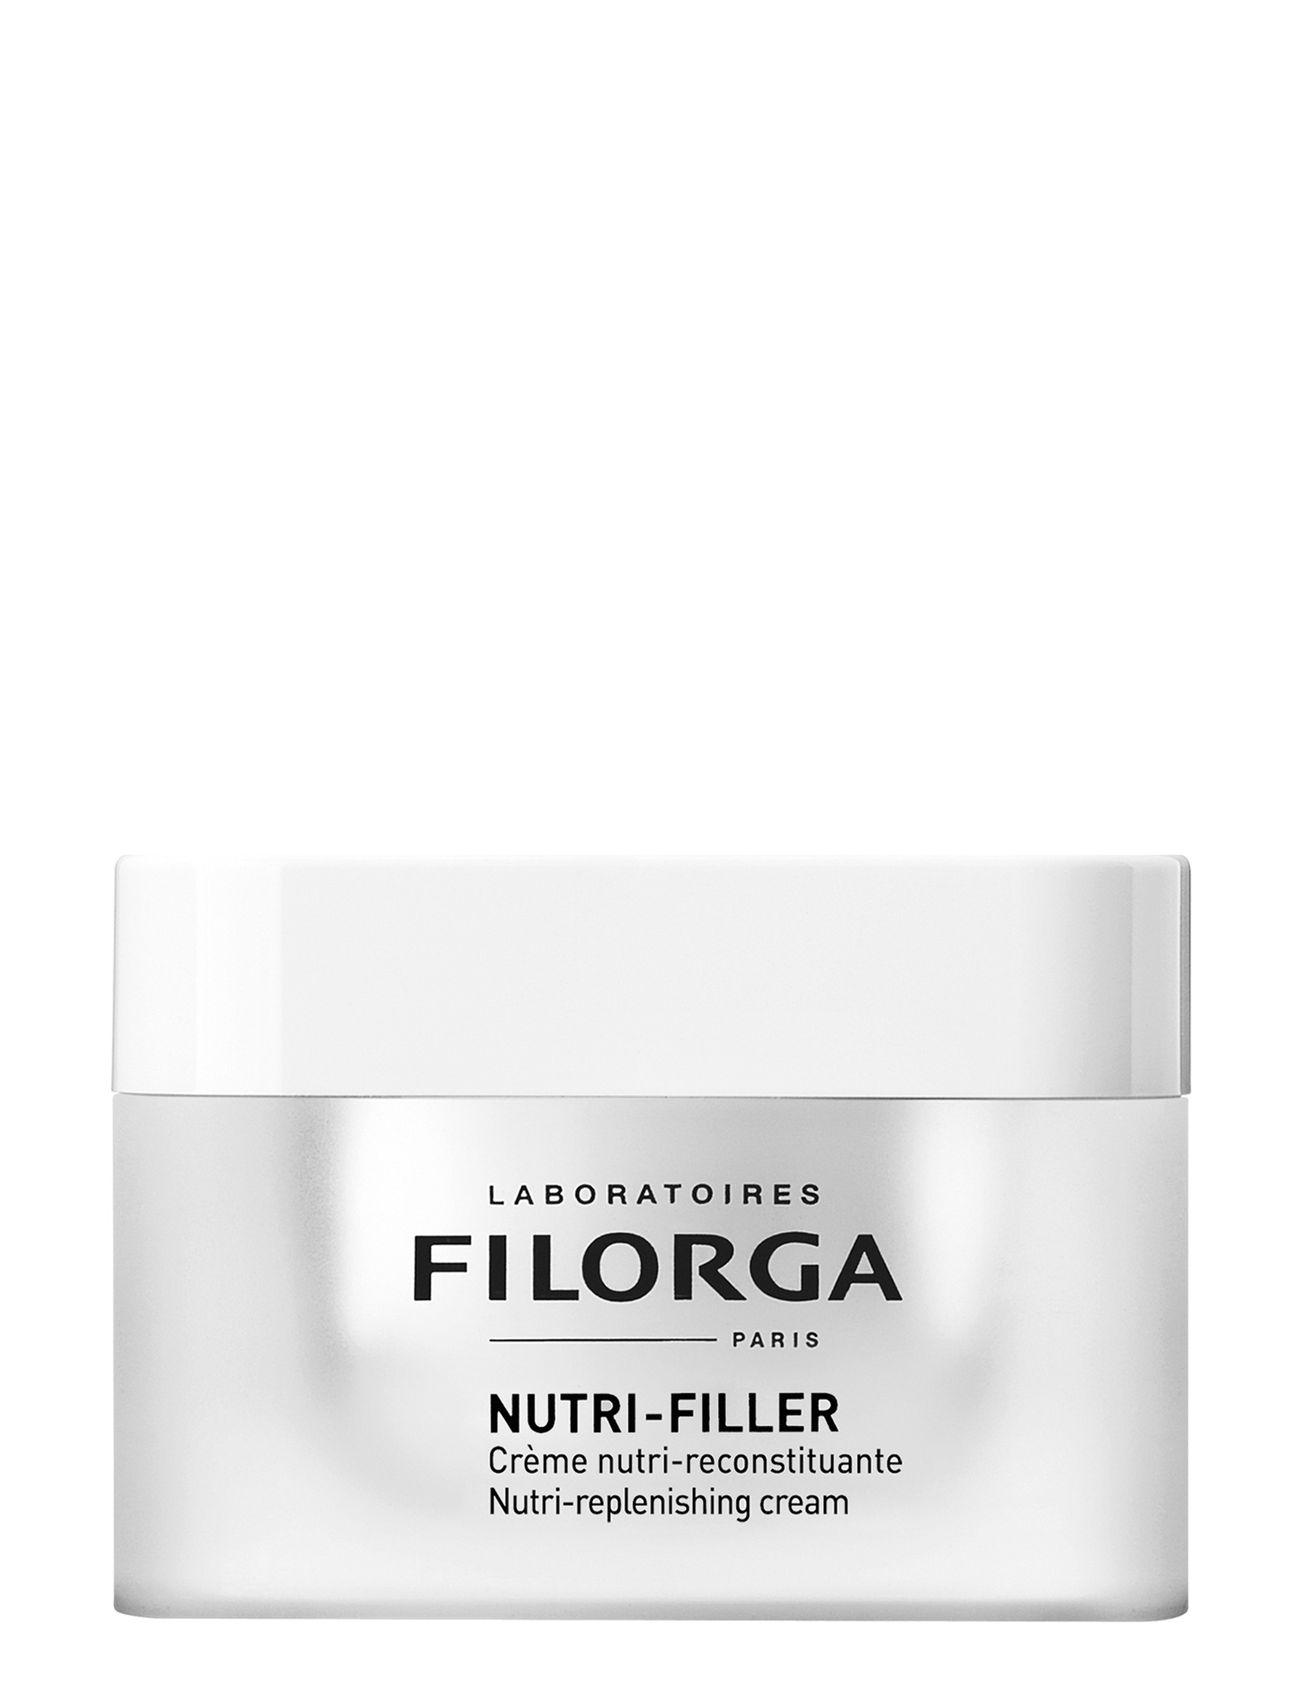 Filorga Nutri-Filler - NO COLOR